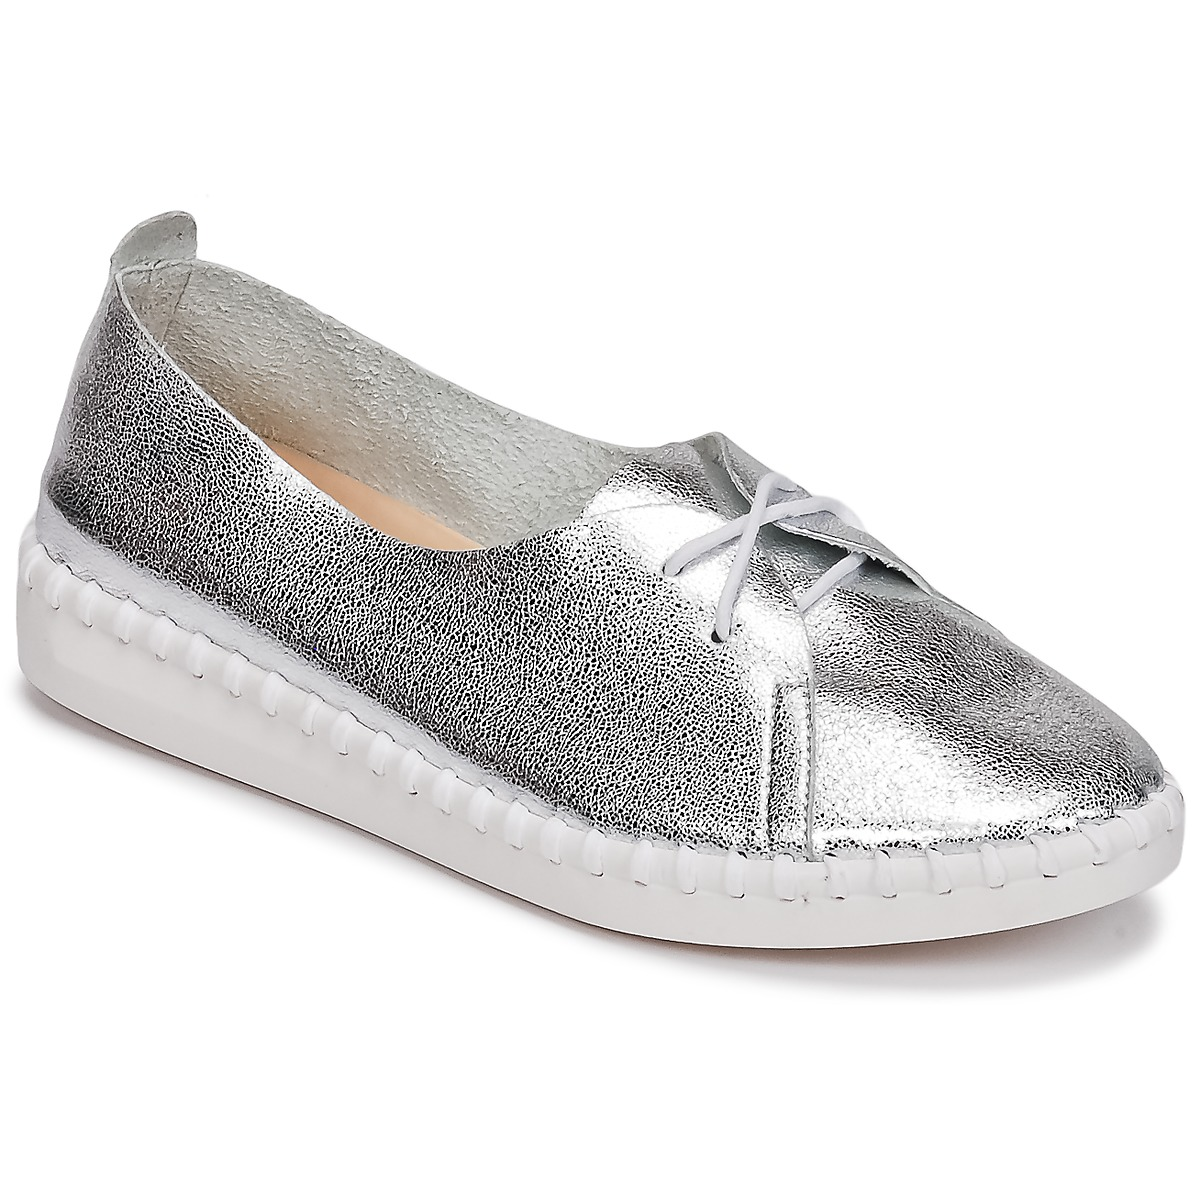 LPB Shoes DEMY Silbern - Kostenloser Versand bei Spartoode ! - Schuhe Derby-Schuhe Damen 31,49 €